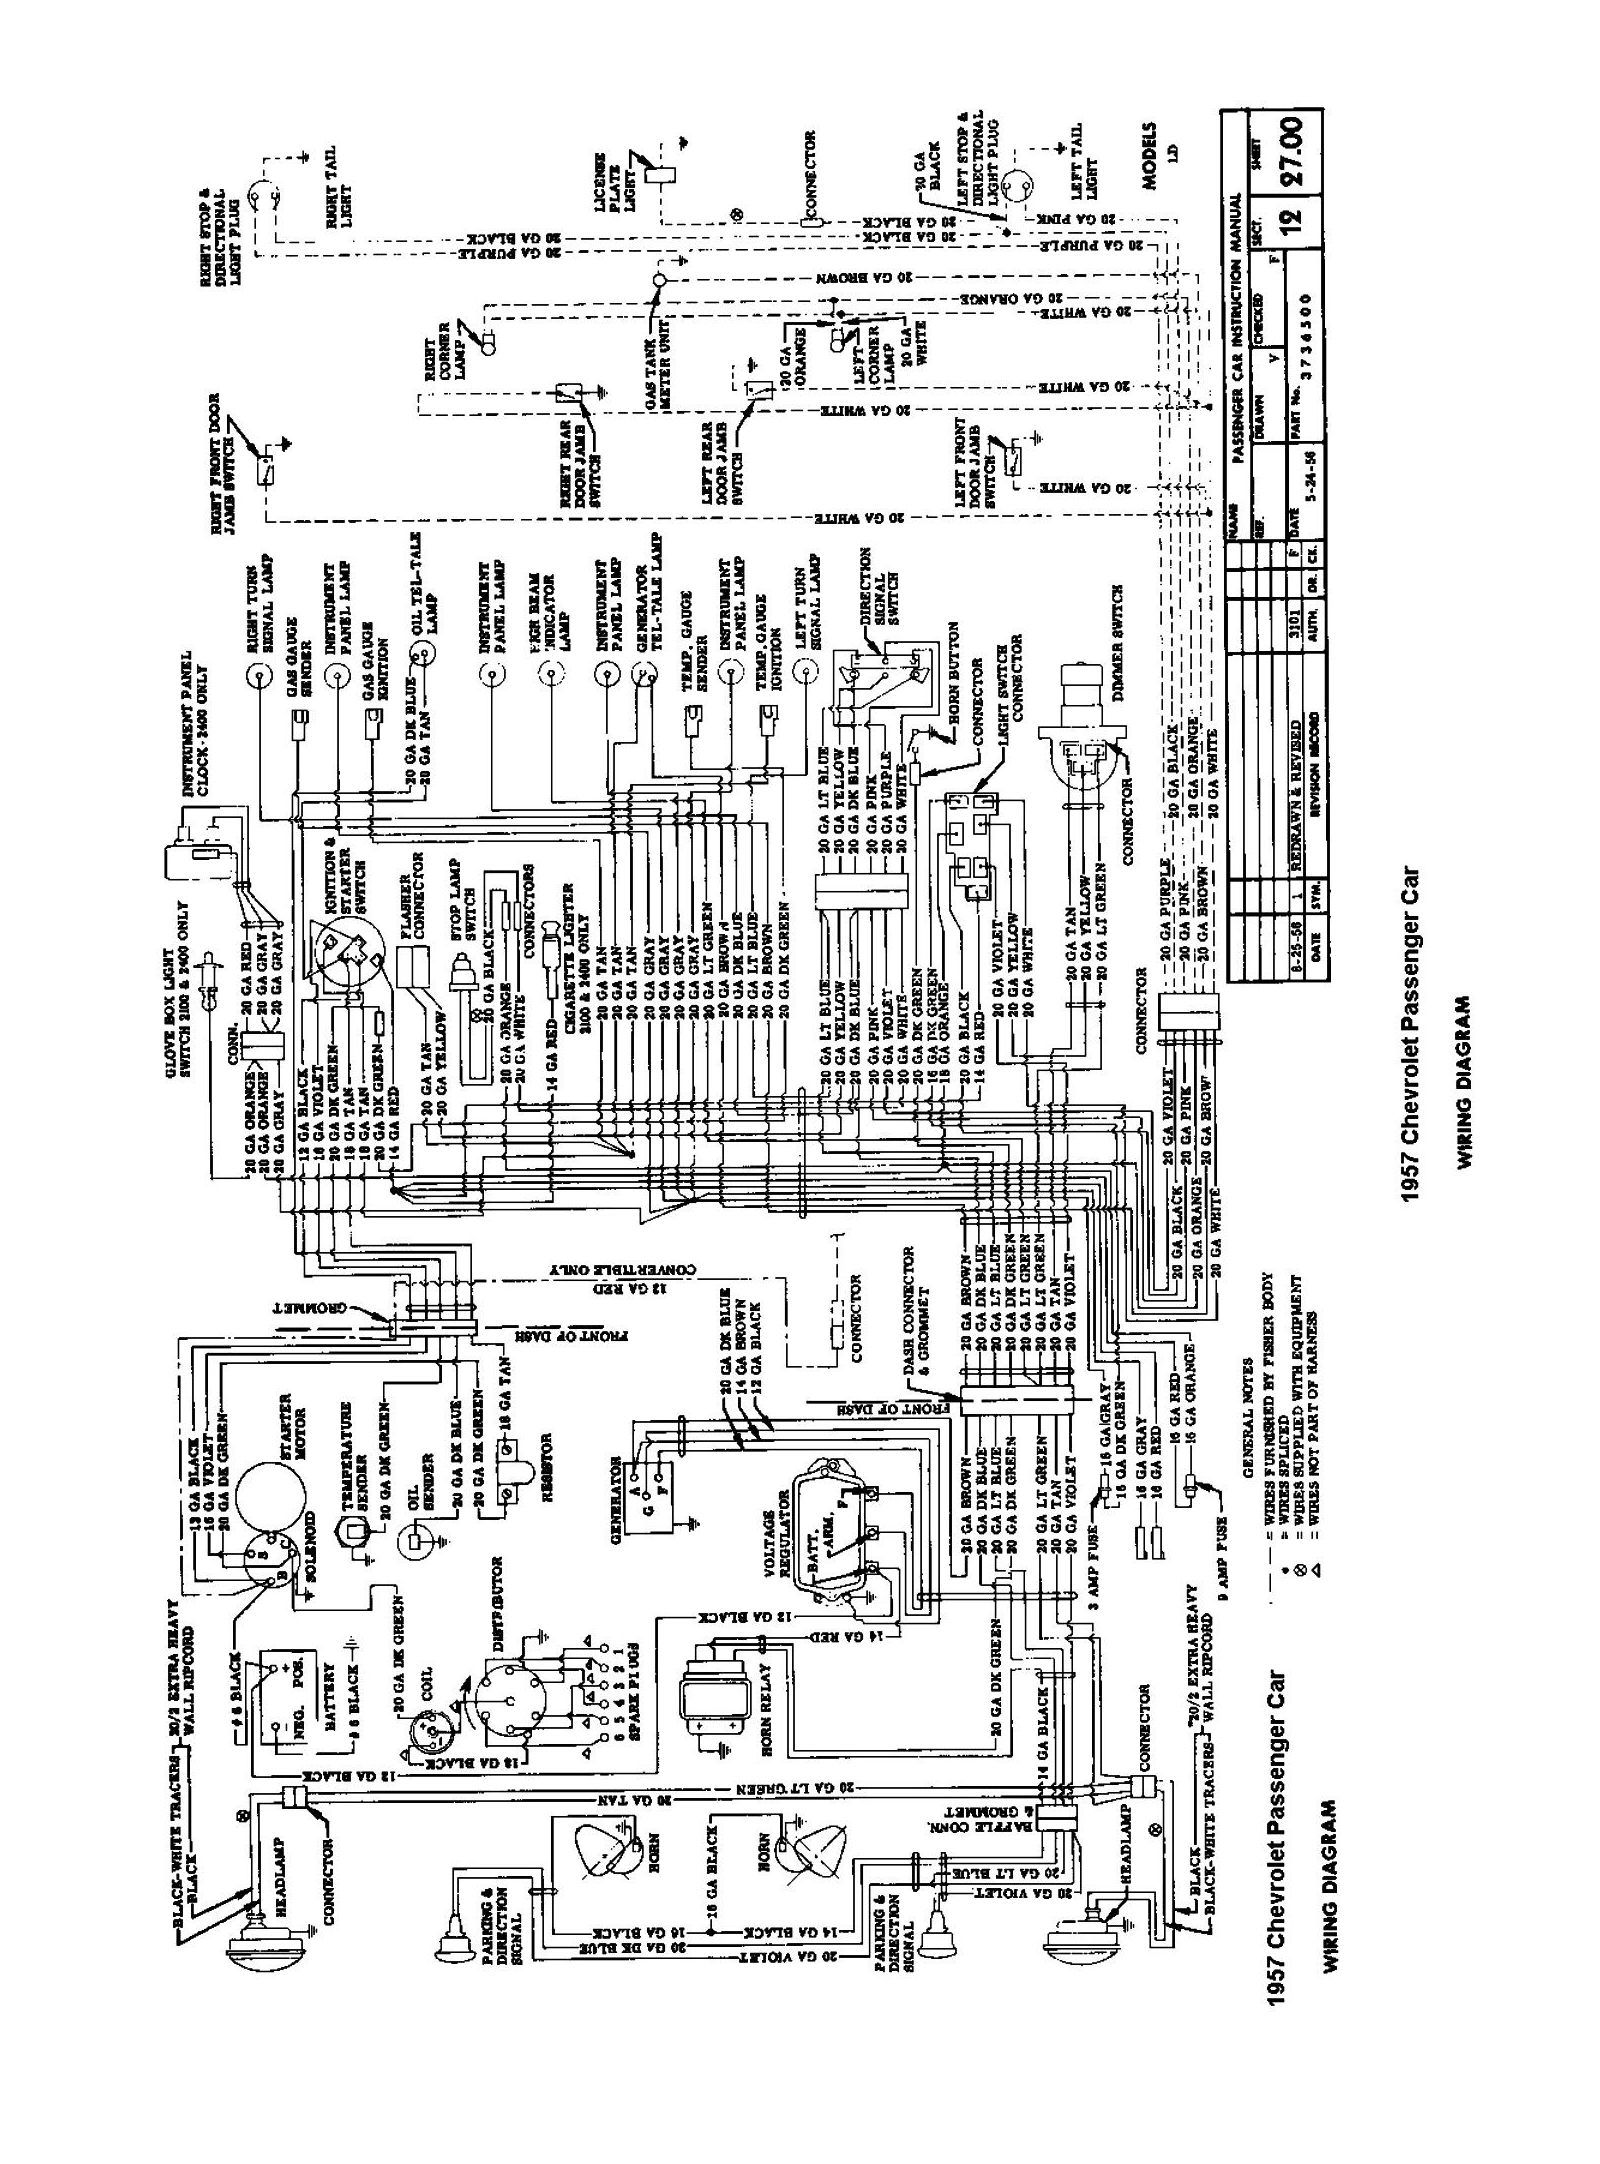 57 chevy wagon wiring diagram